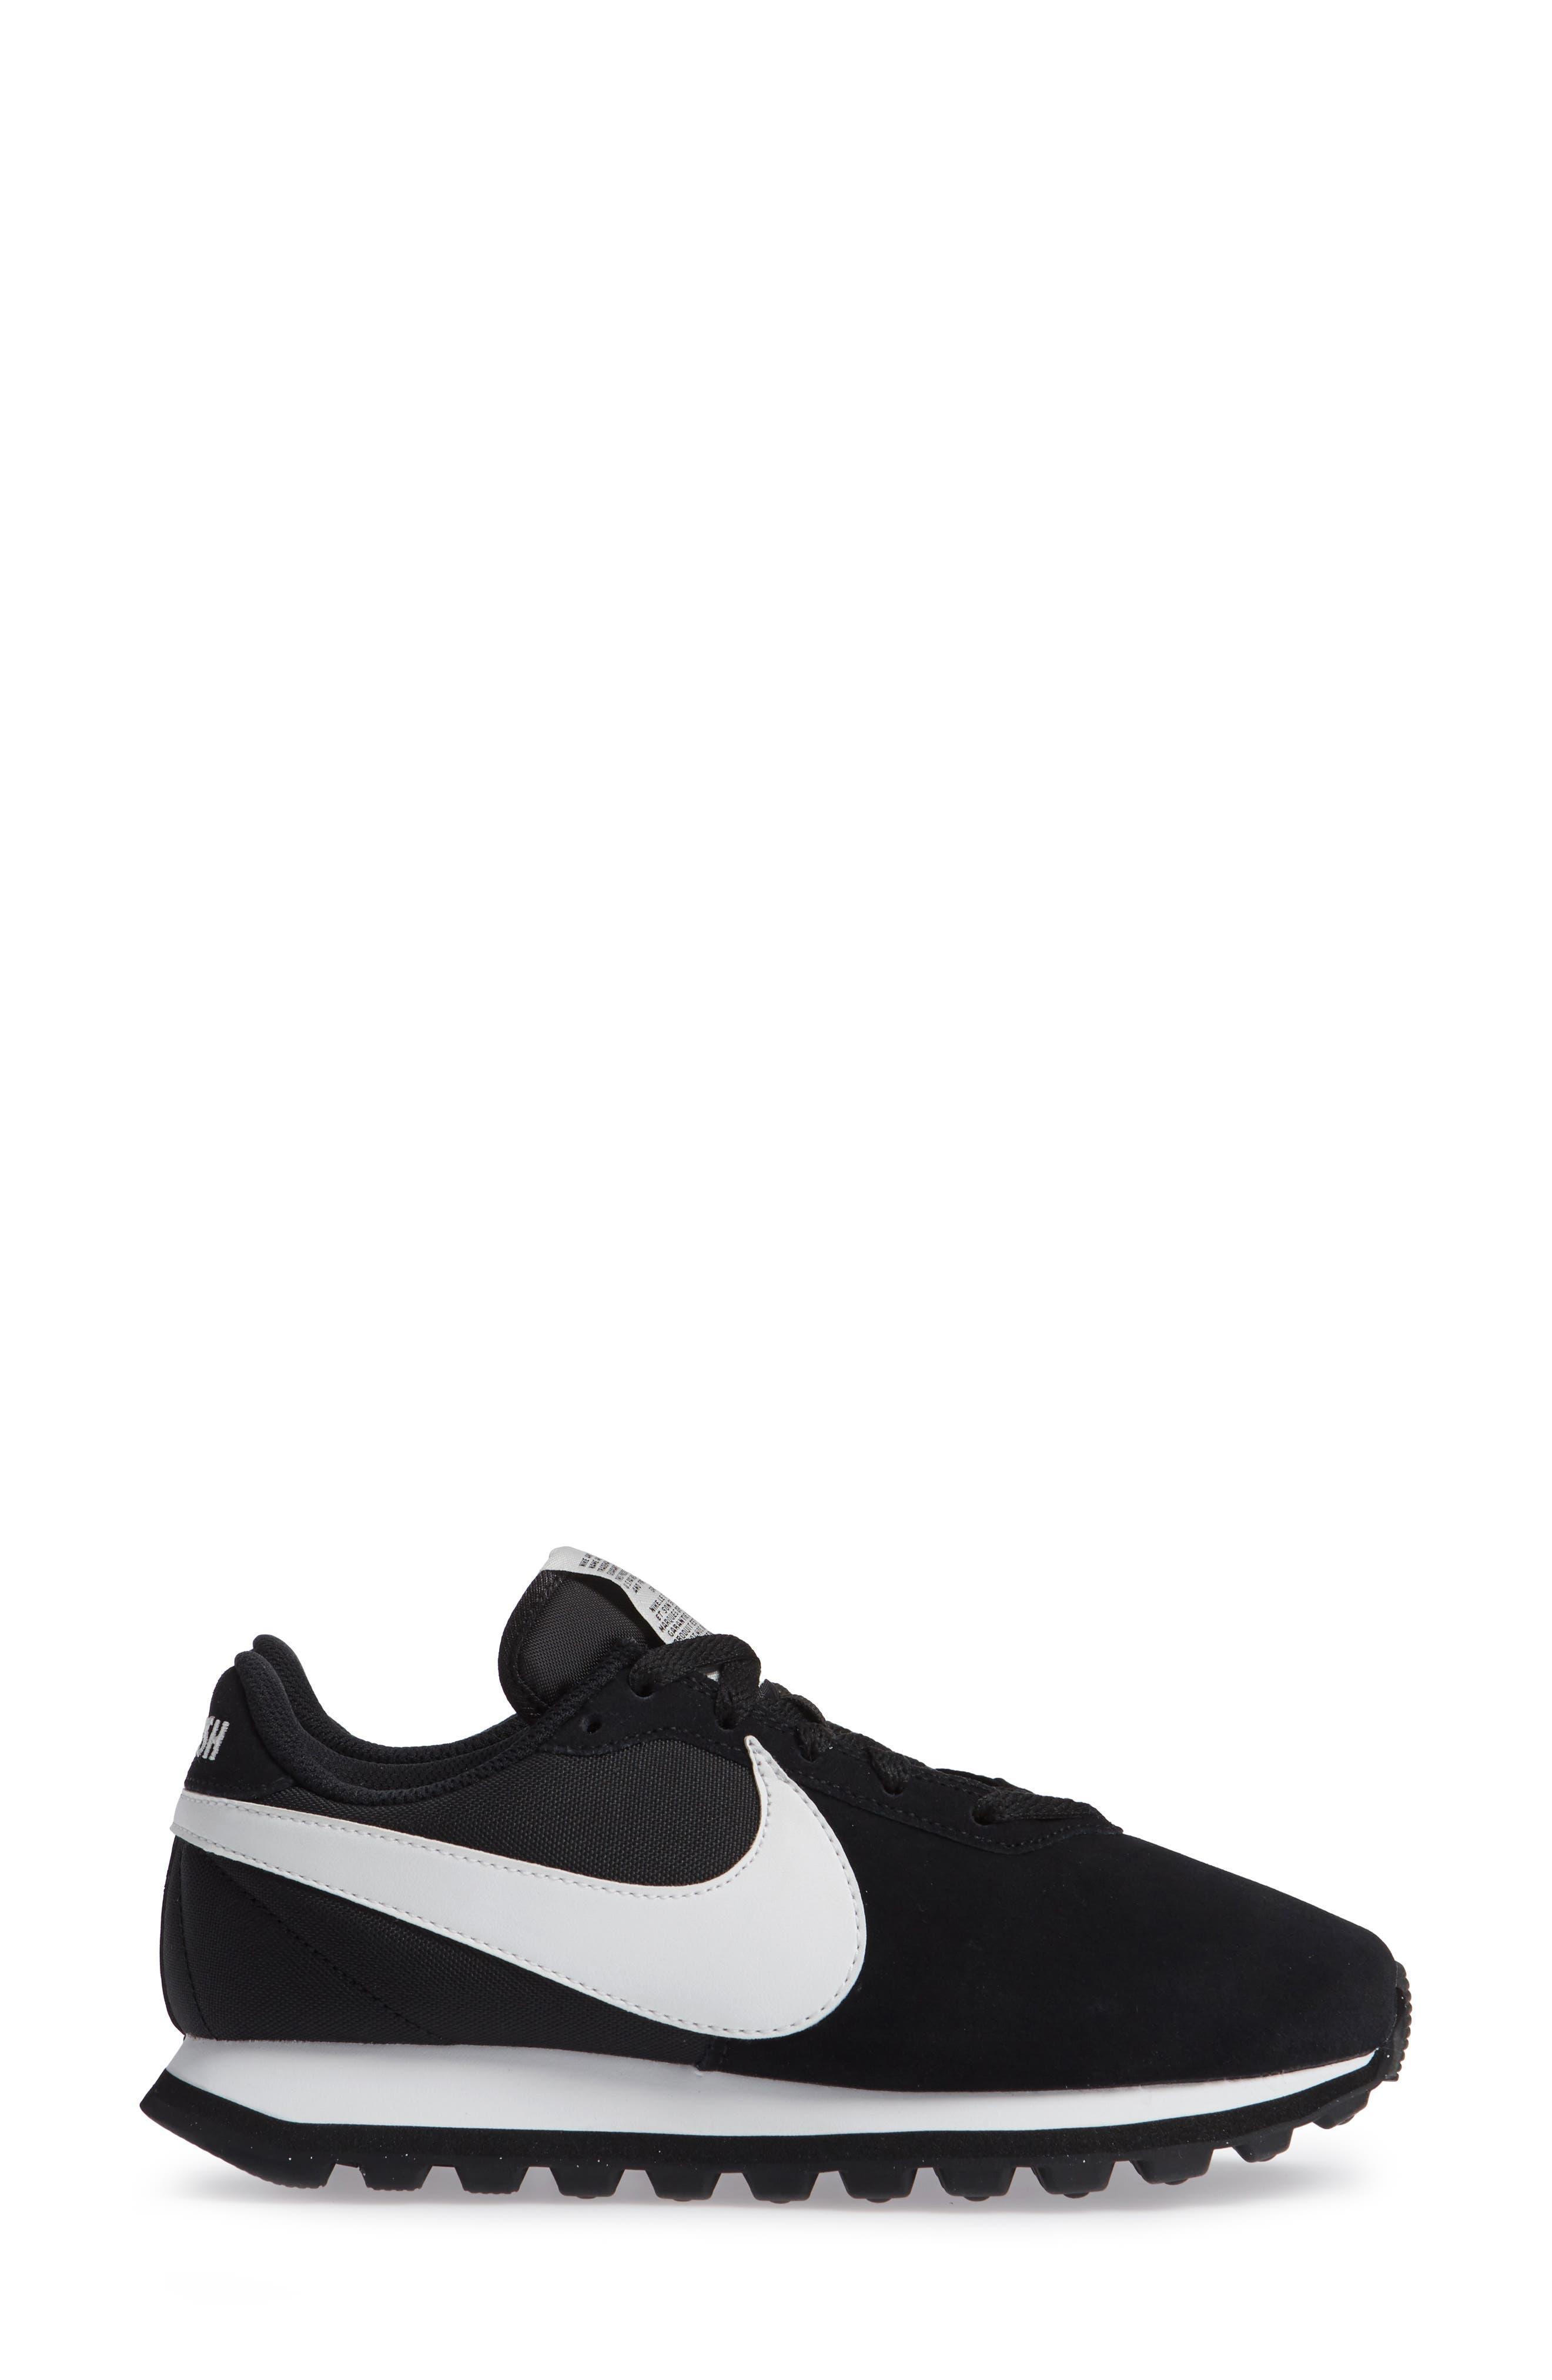 NIKE, Pre Love O.X. Sneaker, Alternate thumbnail 4, color, BLACK/ SUMMIT WHITE